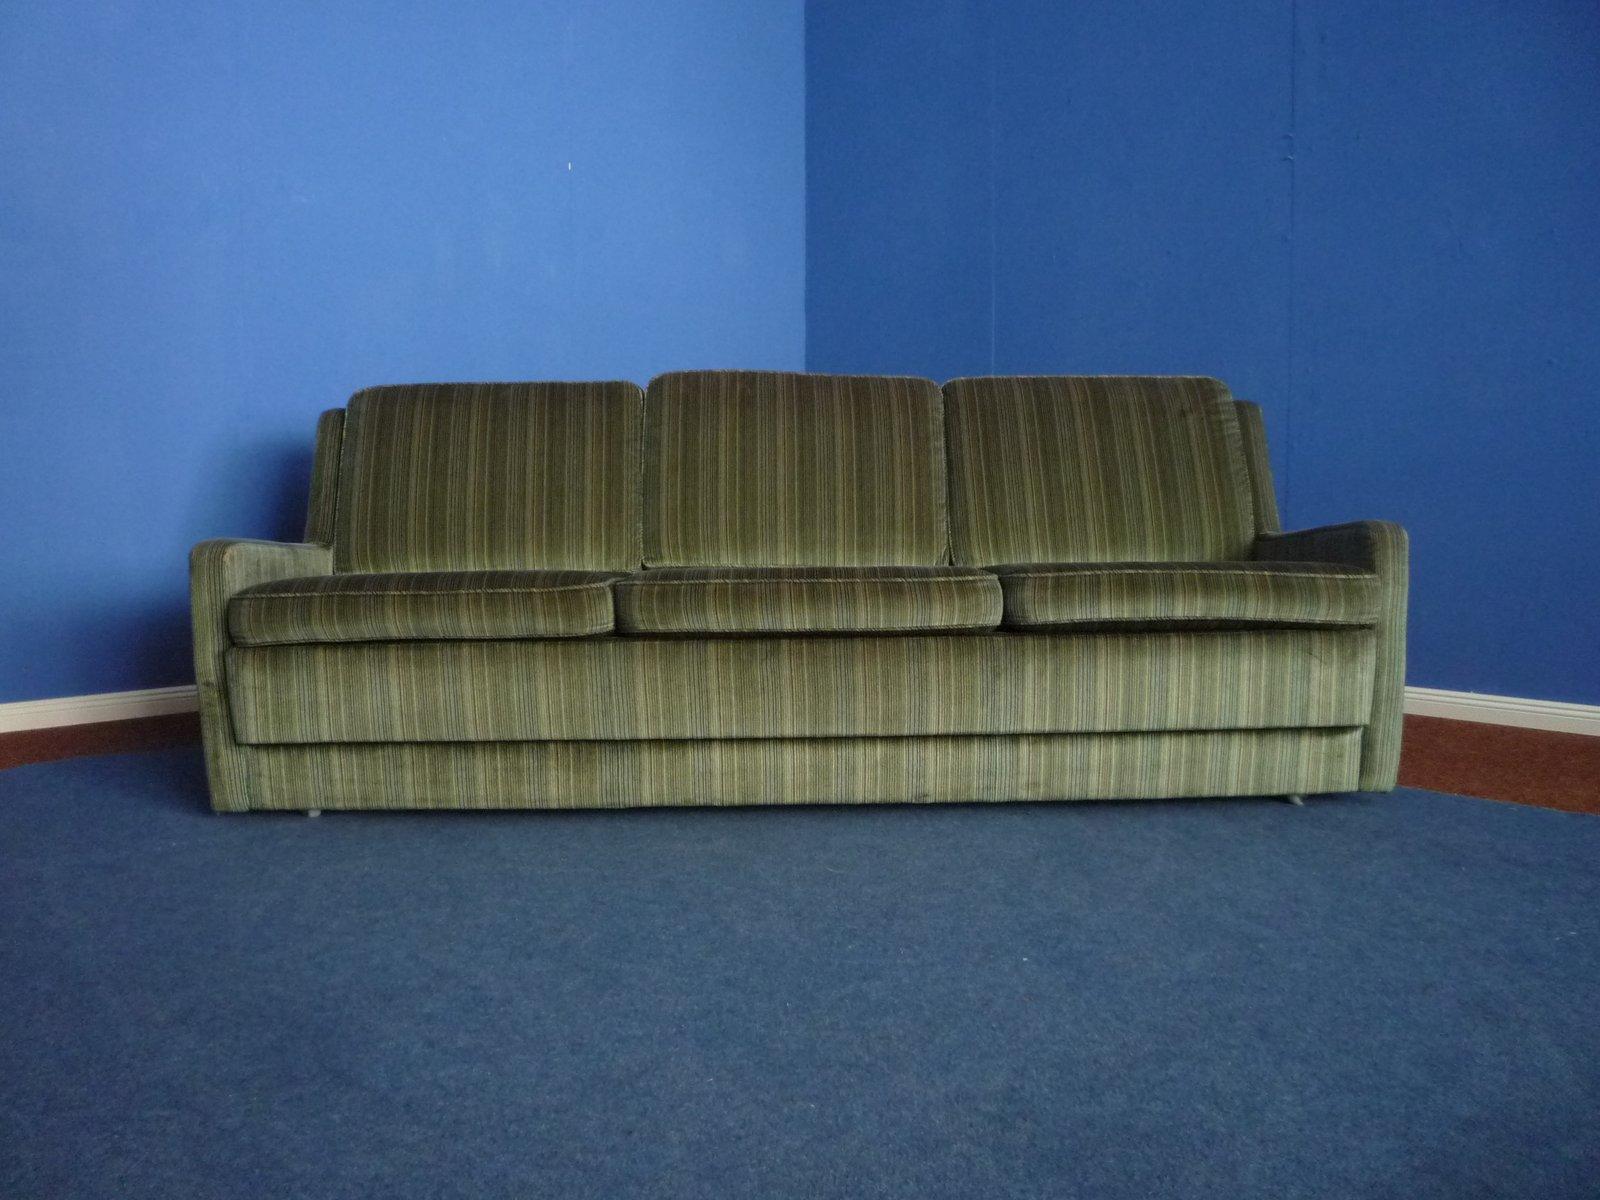 Velour Sofa german velour sofa from kill international 1970s for sale at pamono